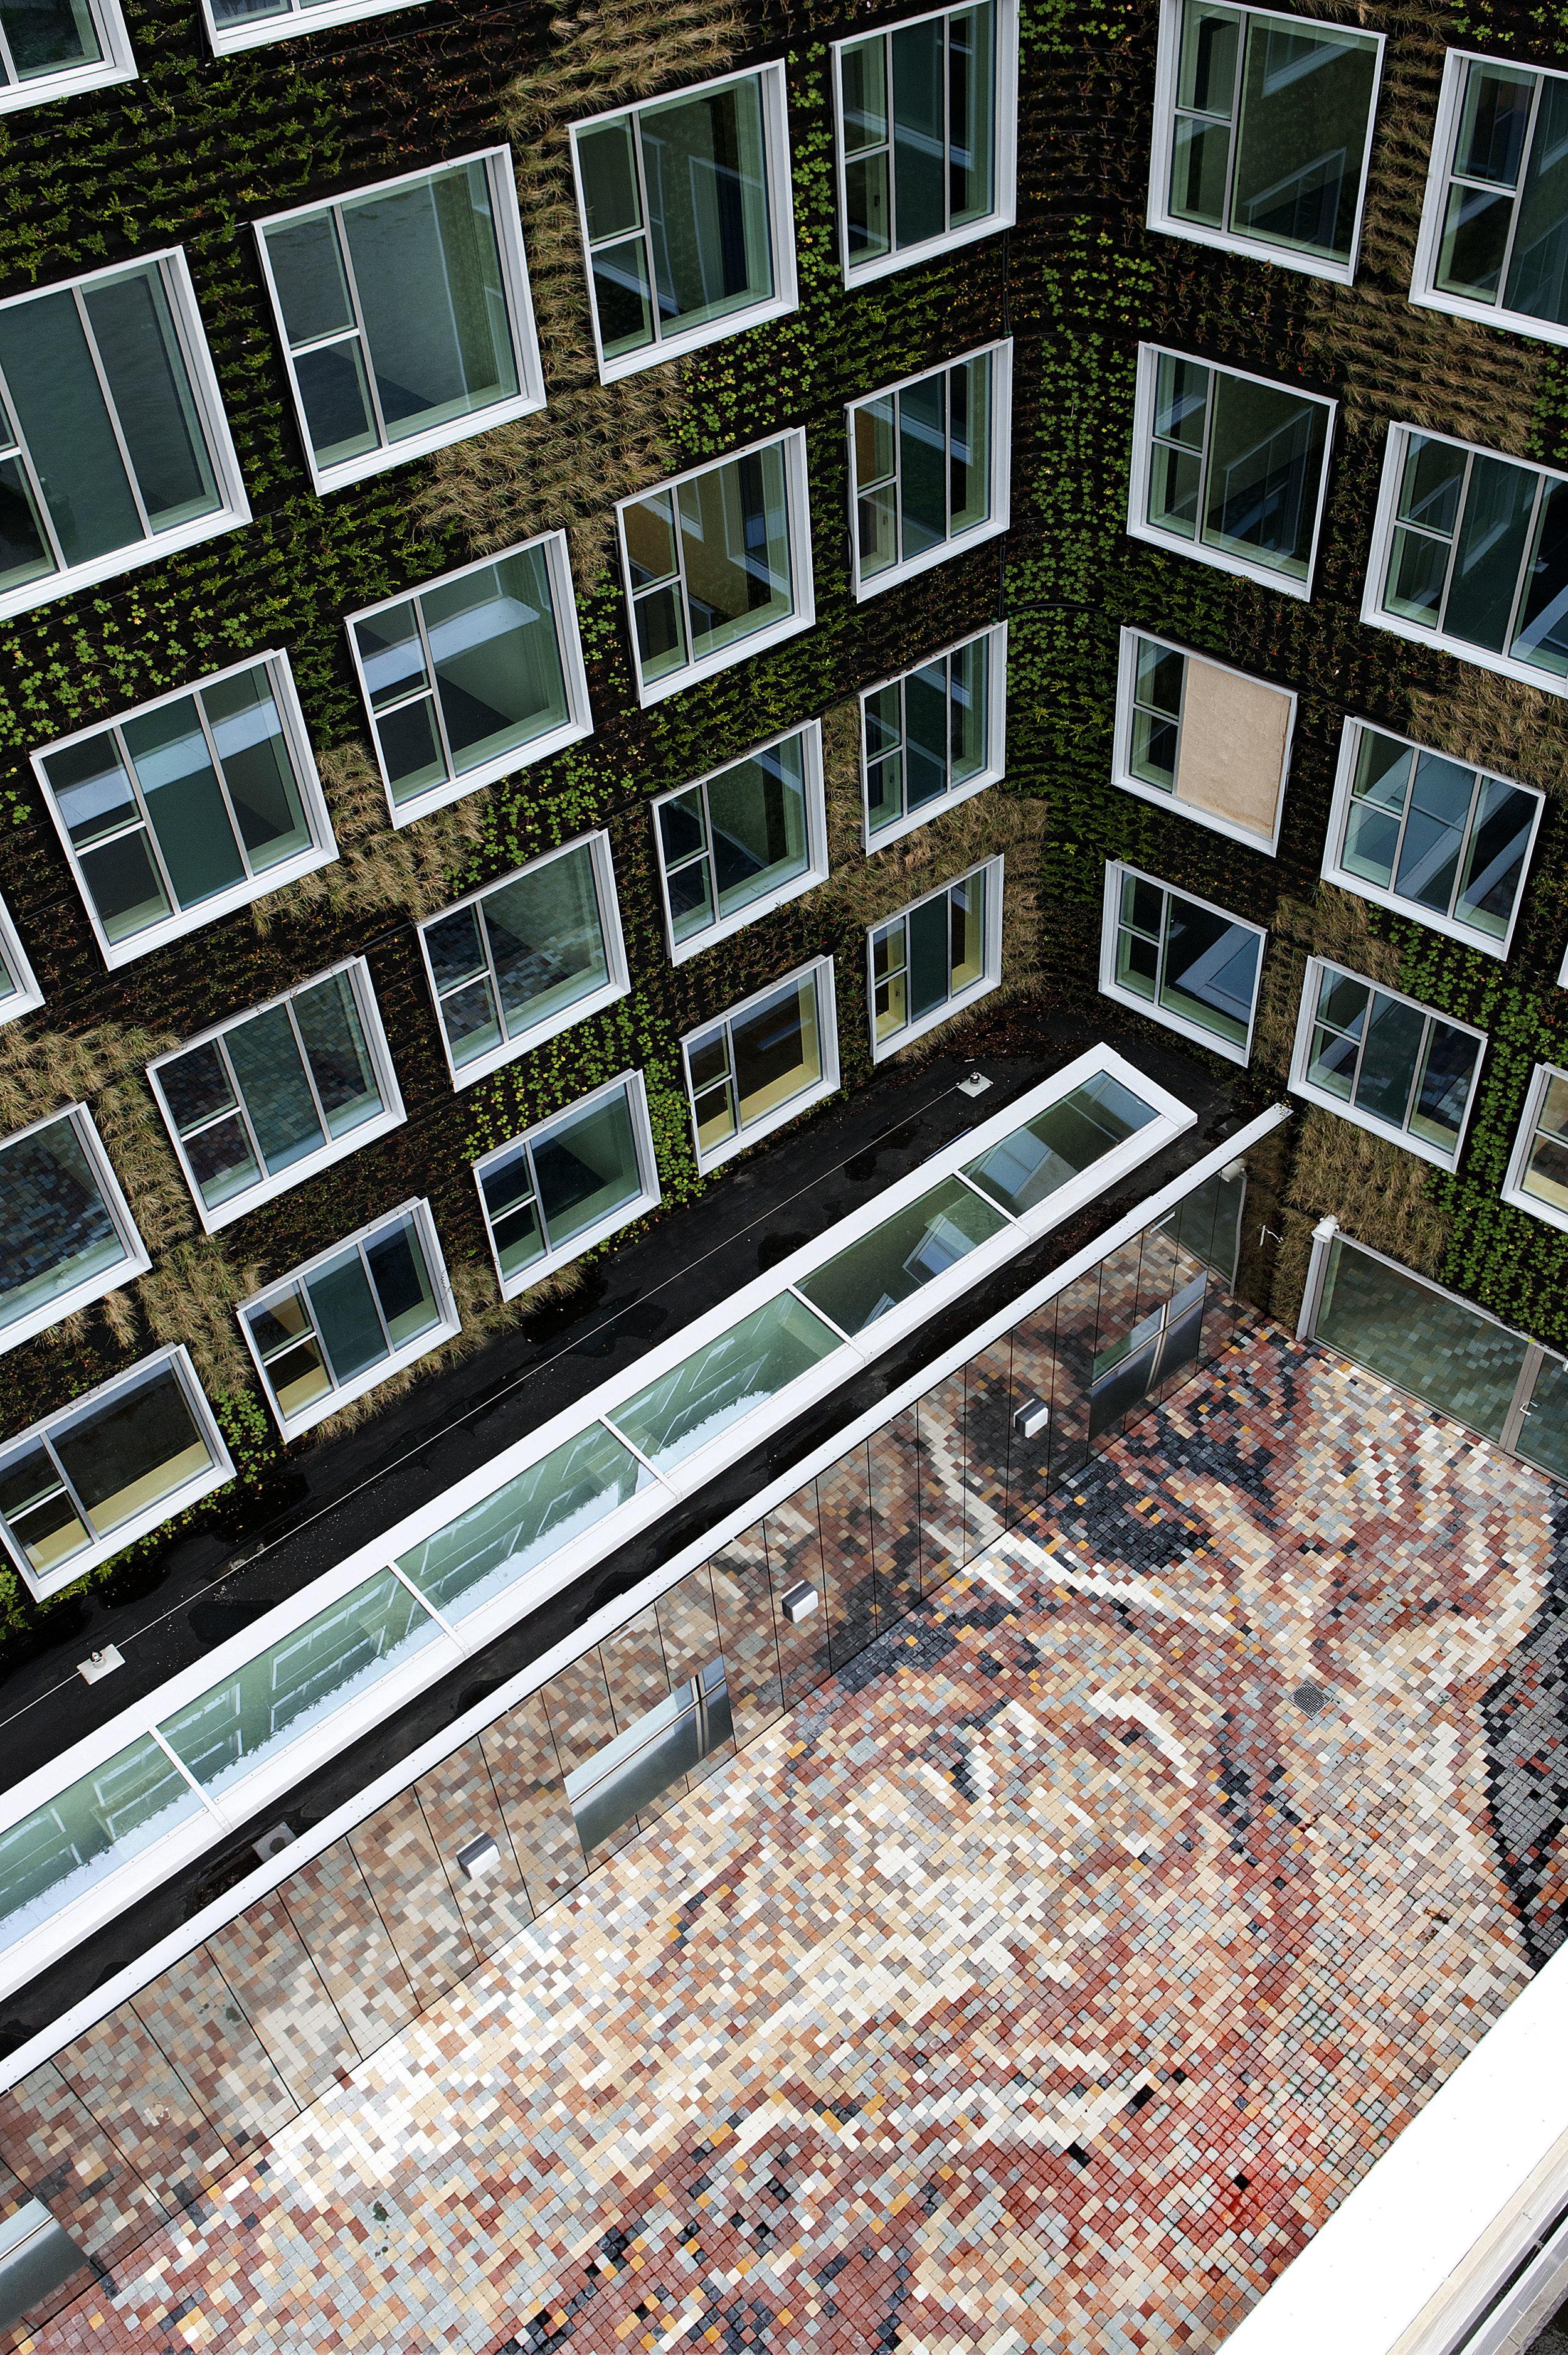 Evil: The abduction of Hippodamia, concrete tiles, 700 x 270 cm